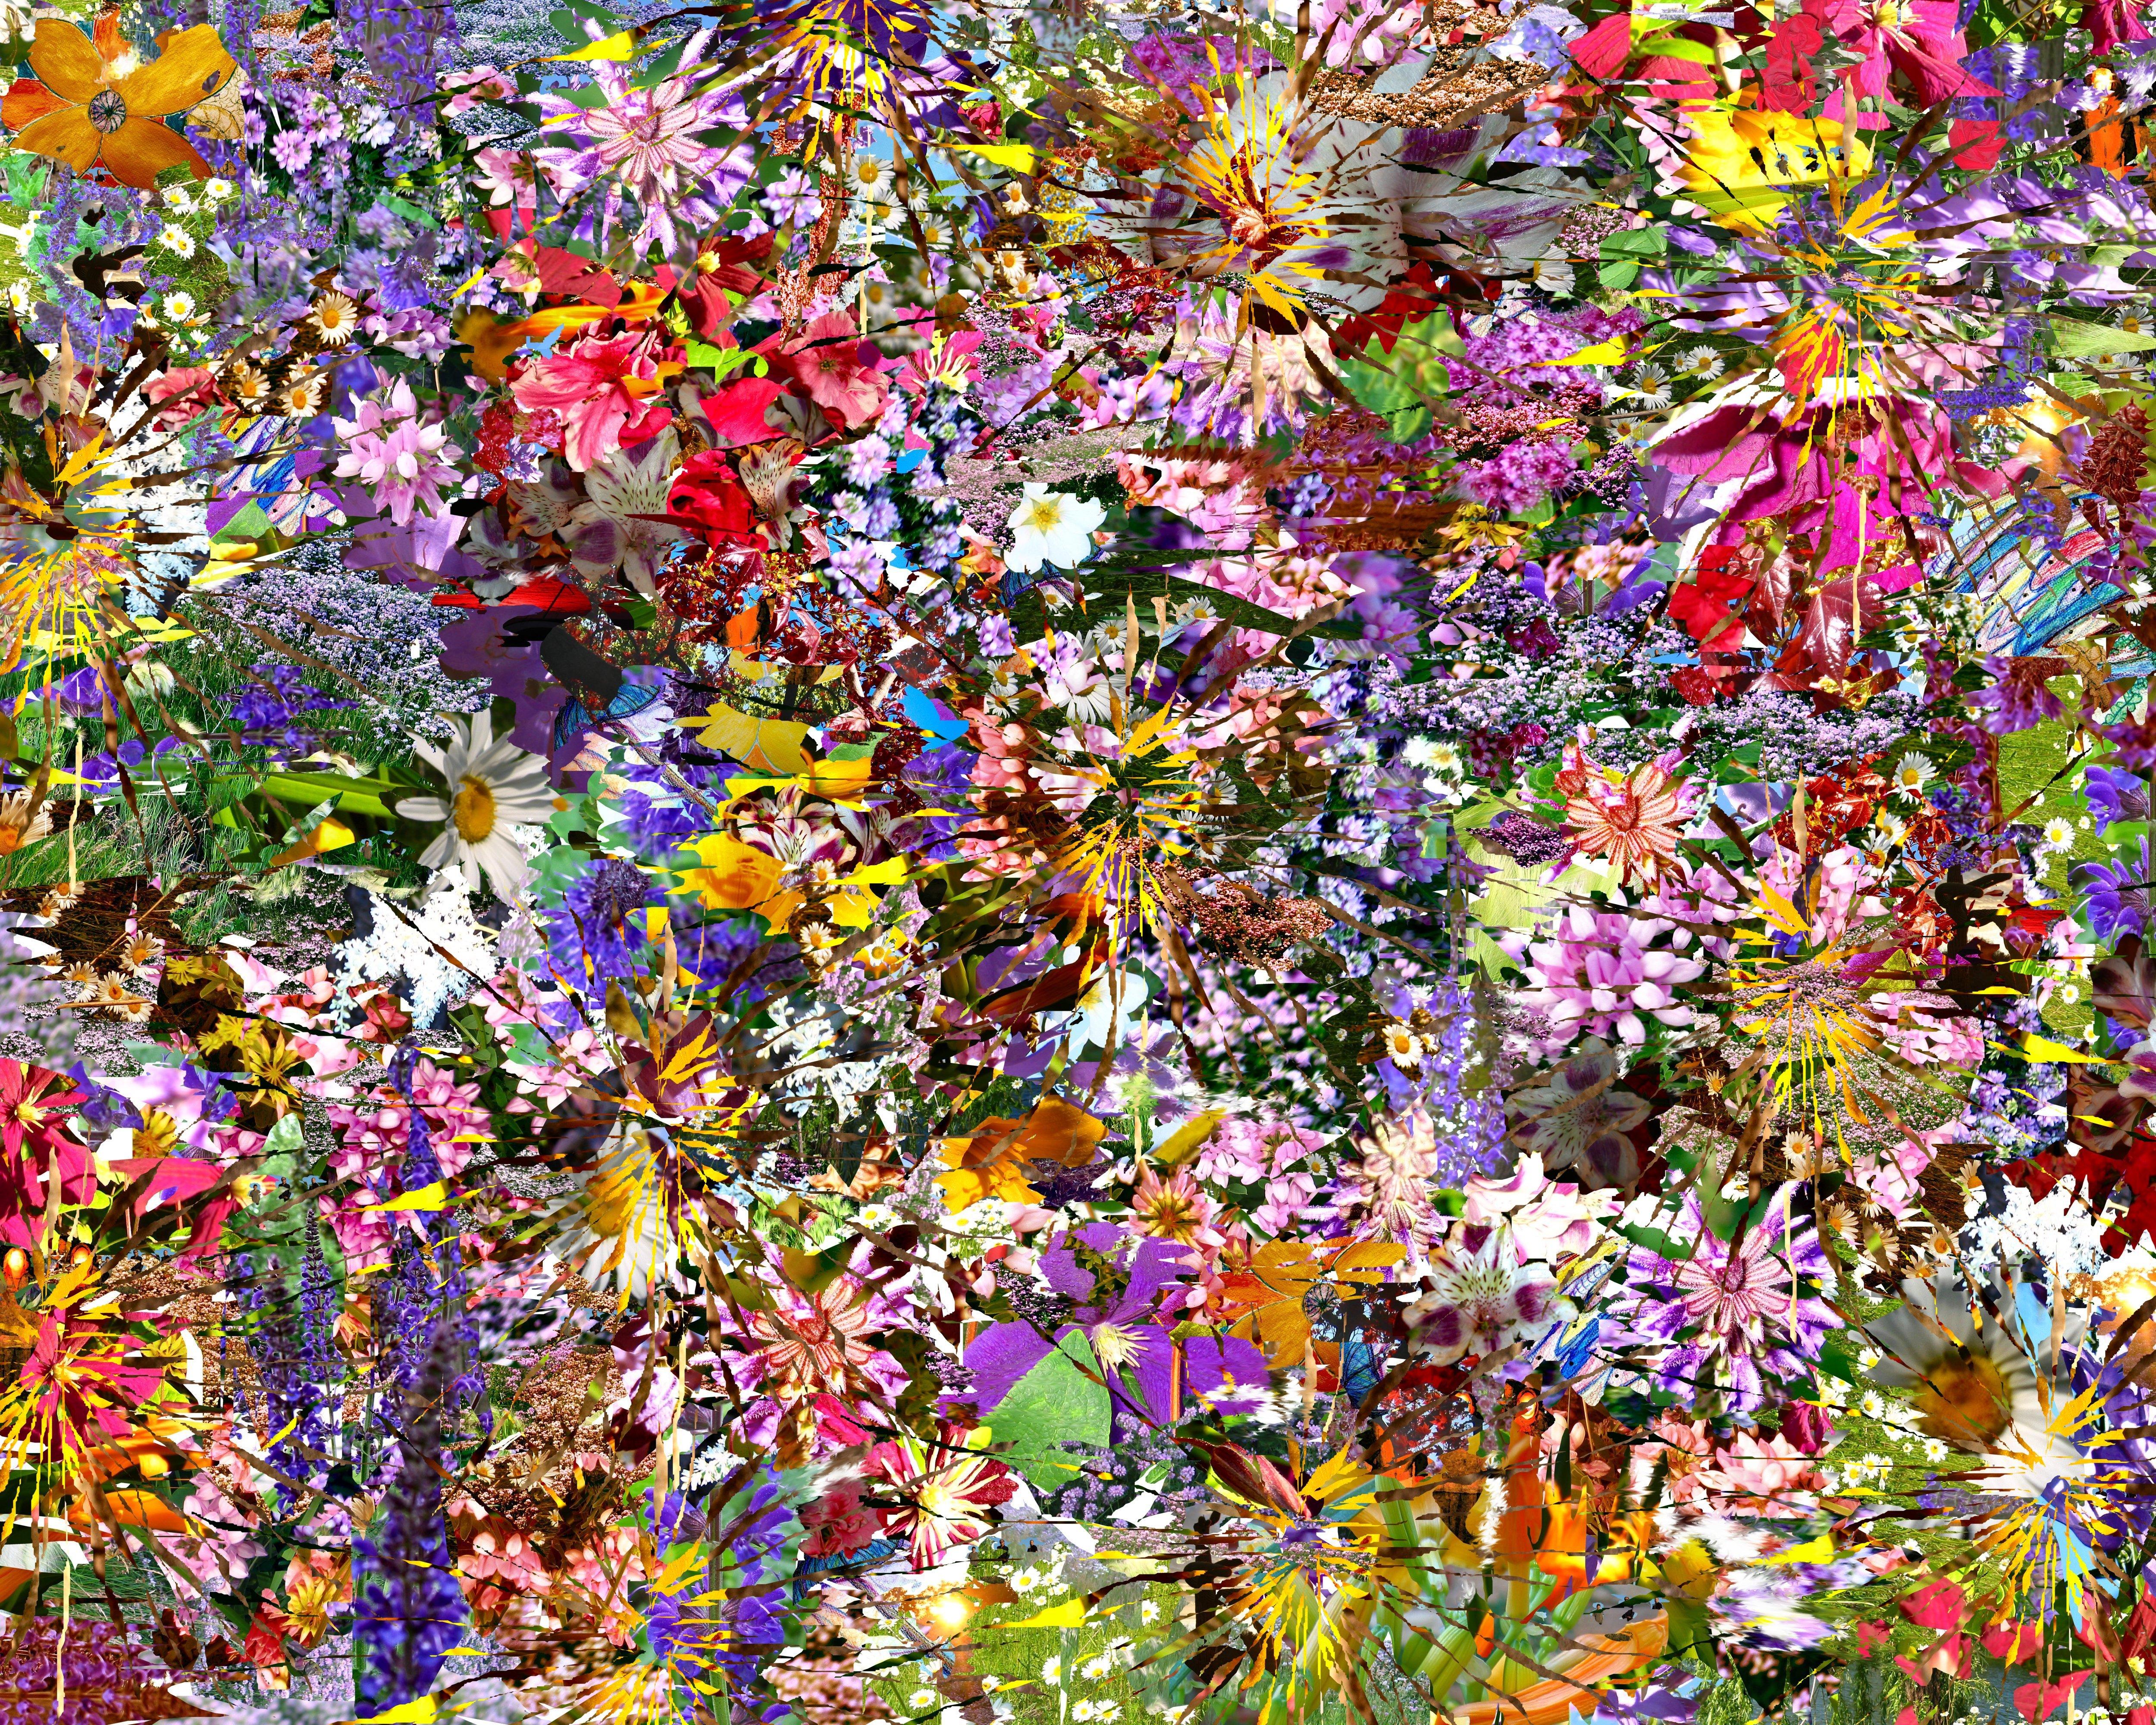 soul amp photo collage psychedelic flower photos flower rainbow bass line on fender guitar. Black Bedroom Furniture Sets. Home Design Ideas